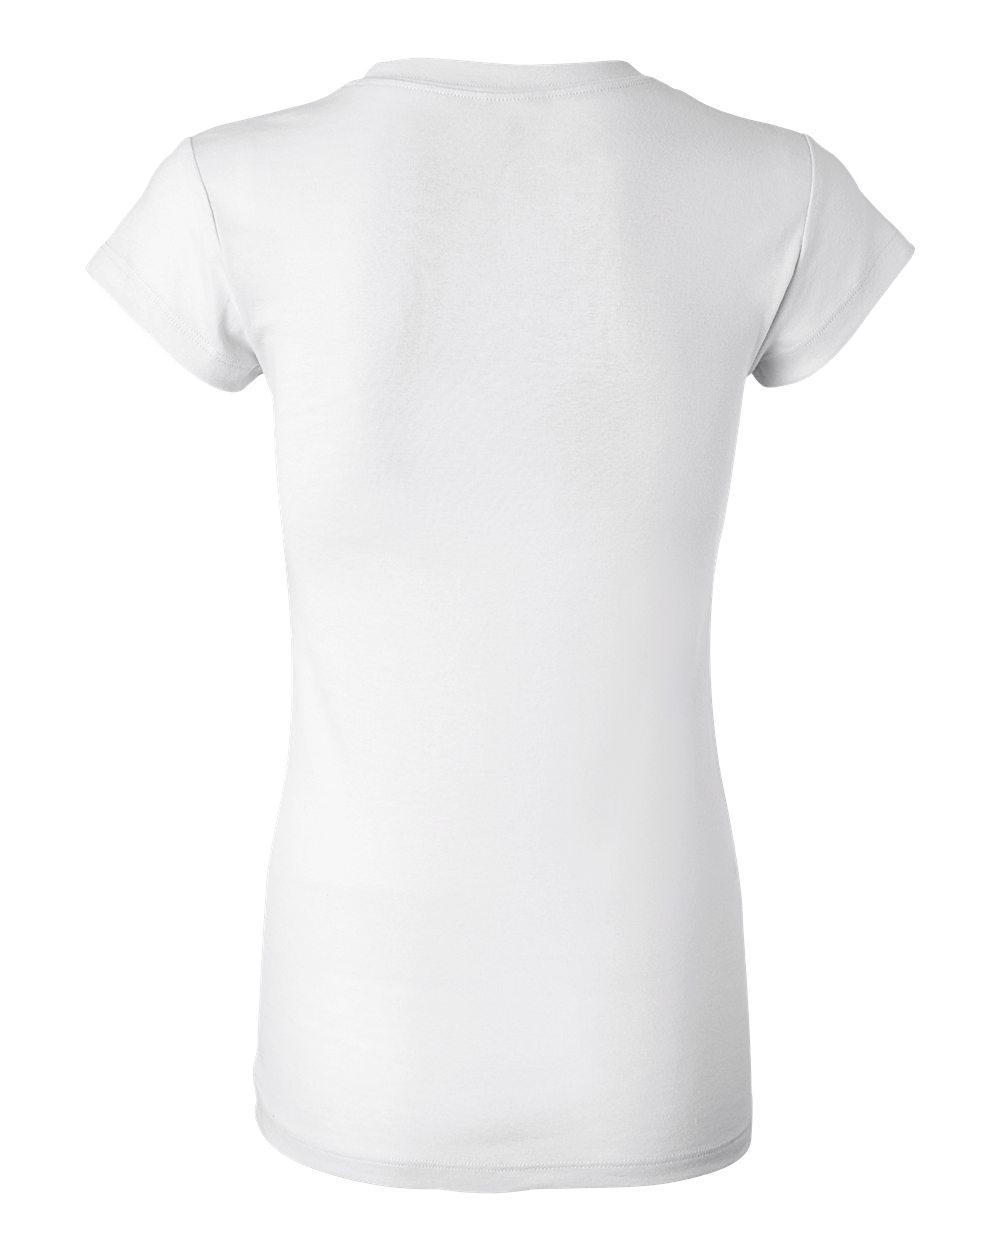 Bella-Canvas-Women-039-s-Sheer-Mini-Rib-Short-Sleeve-T-Shirt-8701-S-2XL thumbnail 13